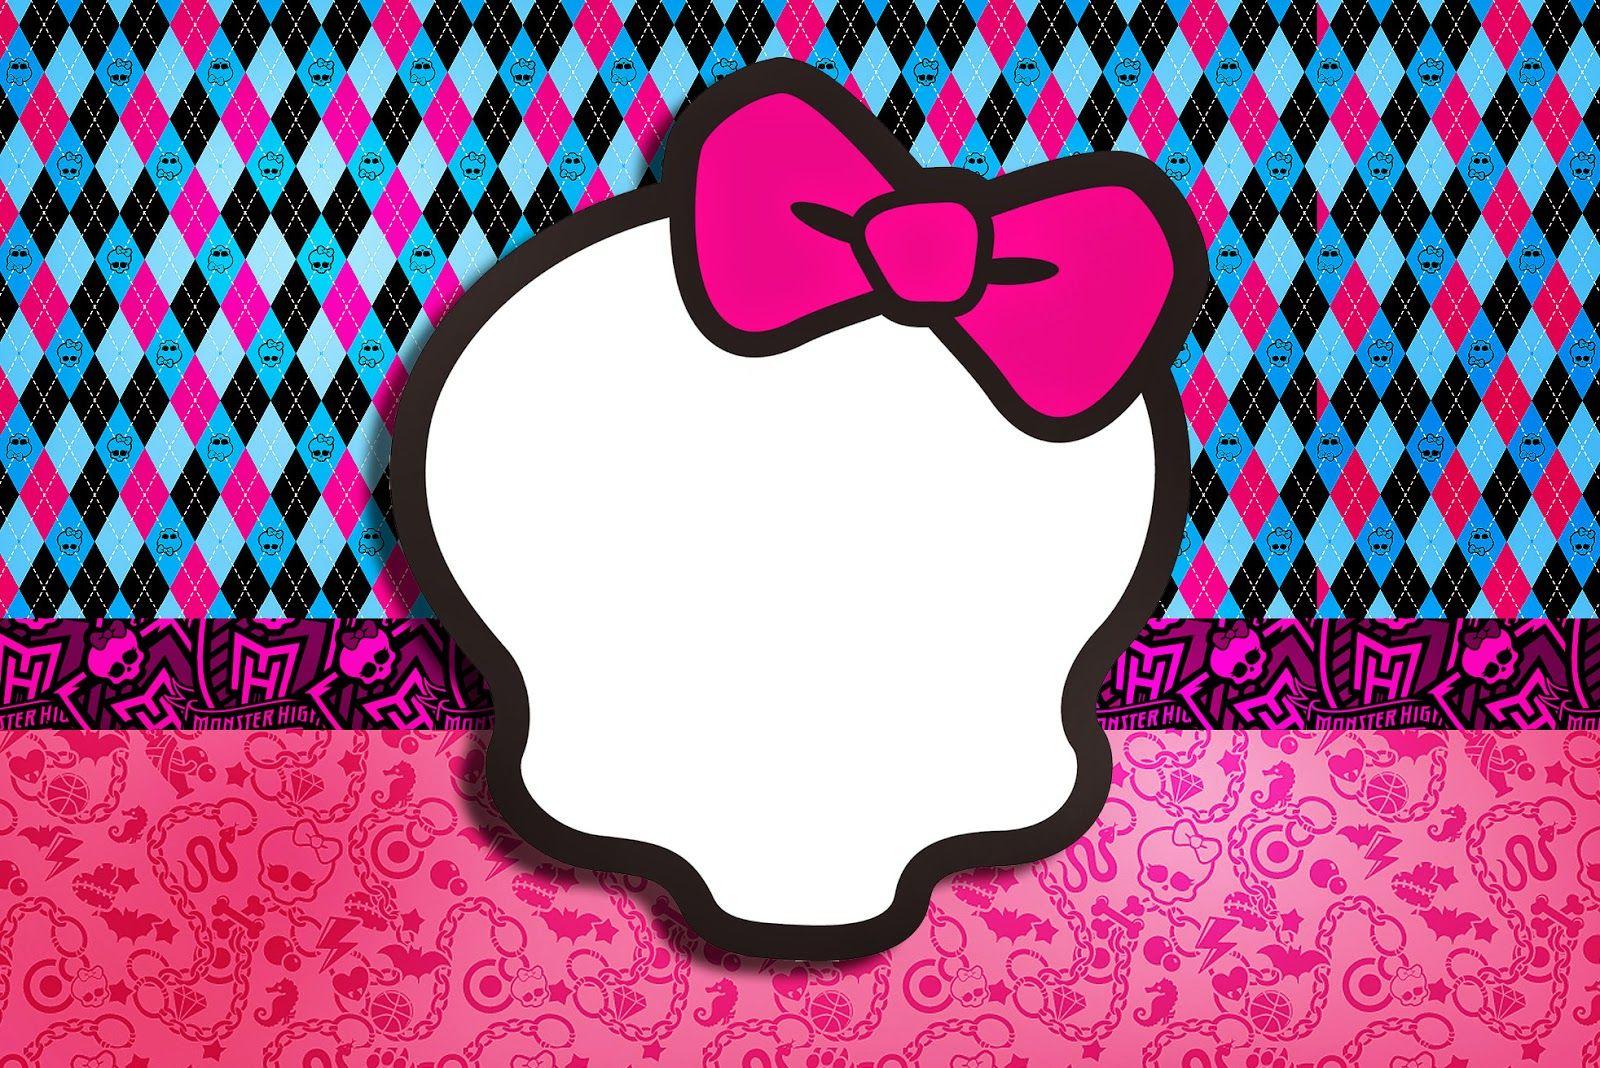 Pink Monster High: Free Printable Invitations. | Monster high ...